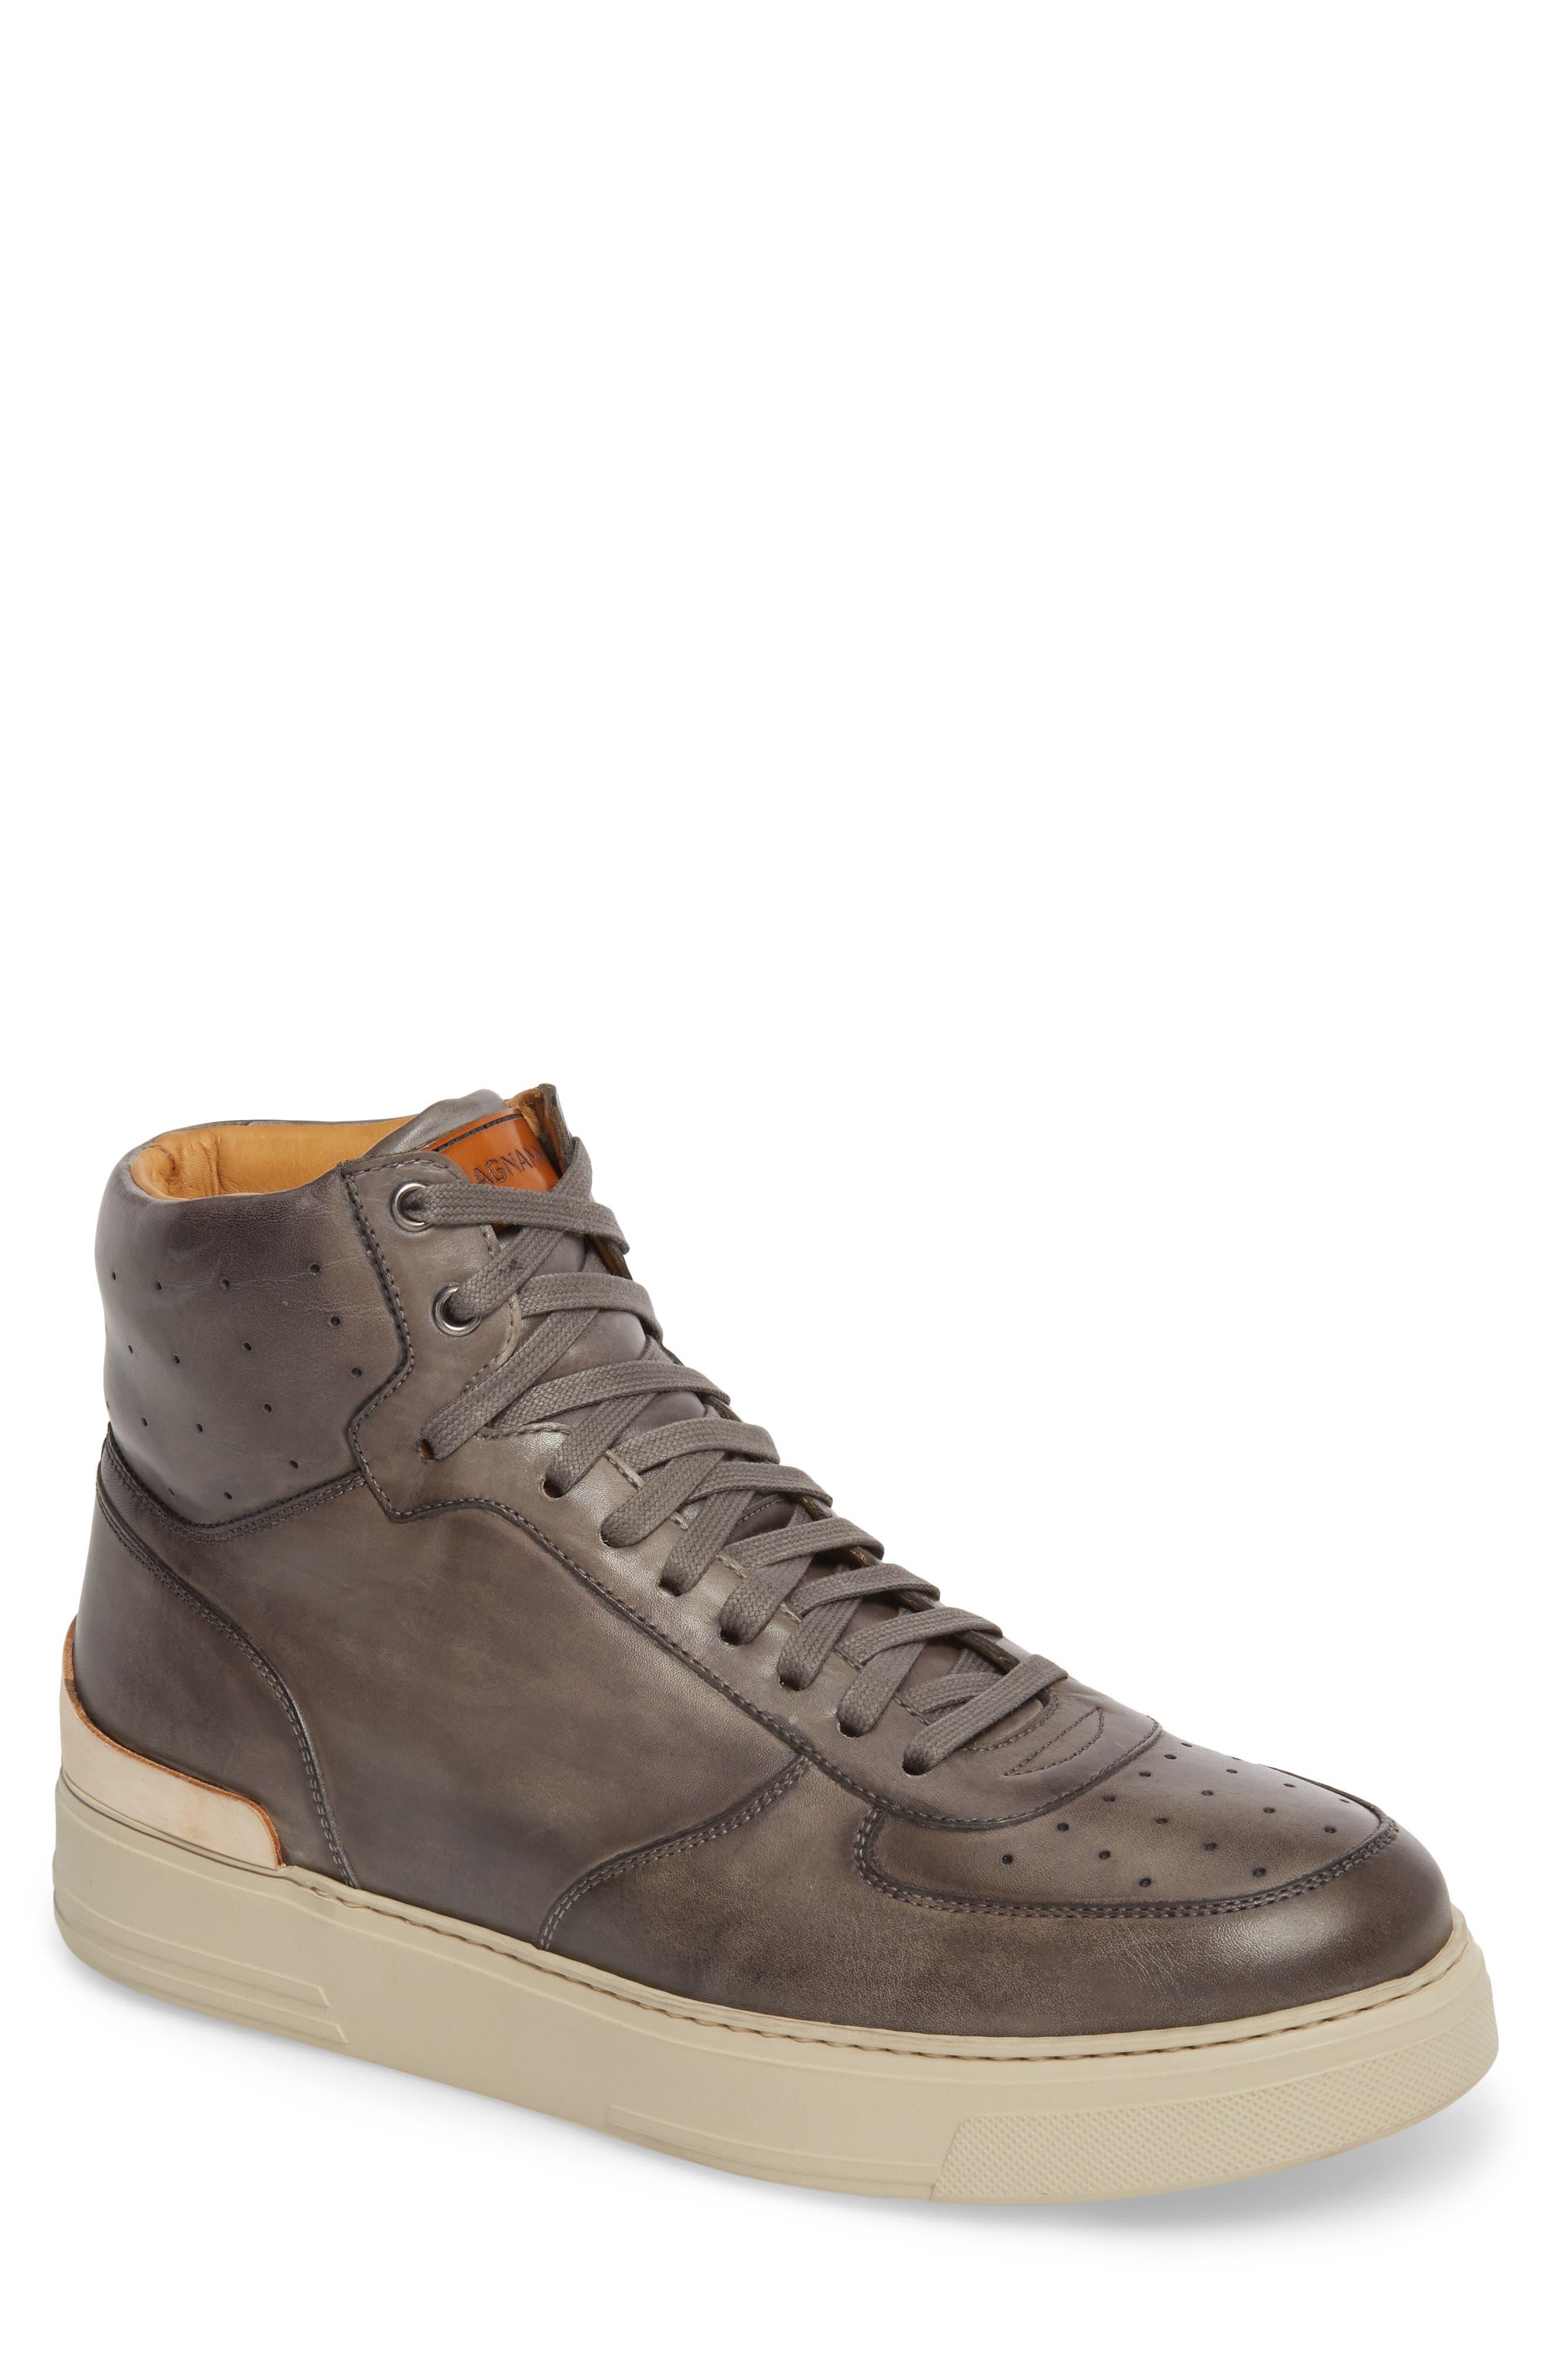 Varro Hi Top Lace Up Sneaker,                         Main,                         color, 021